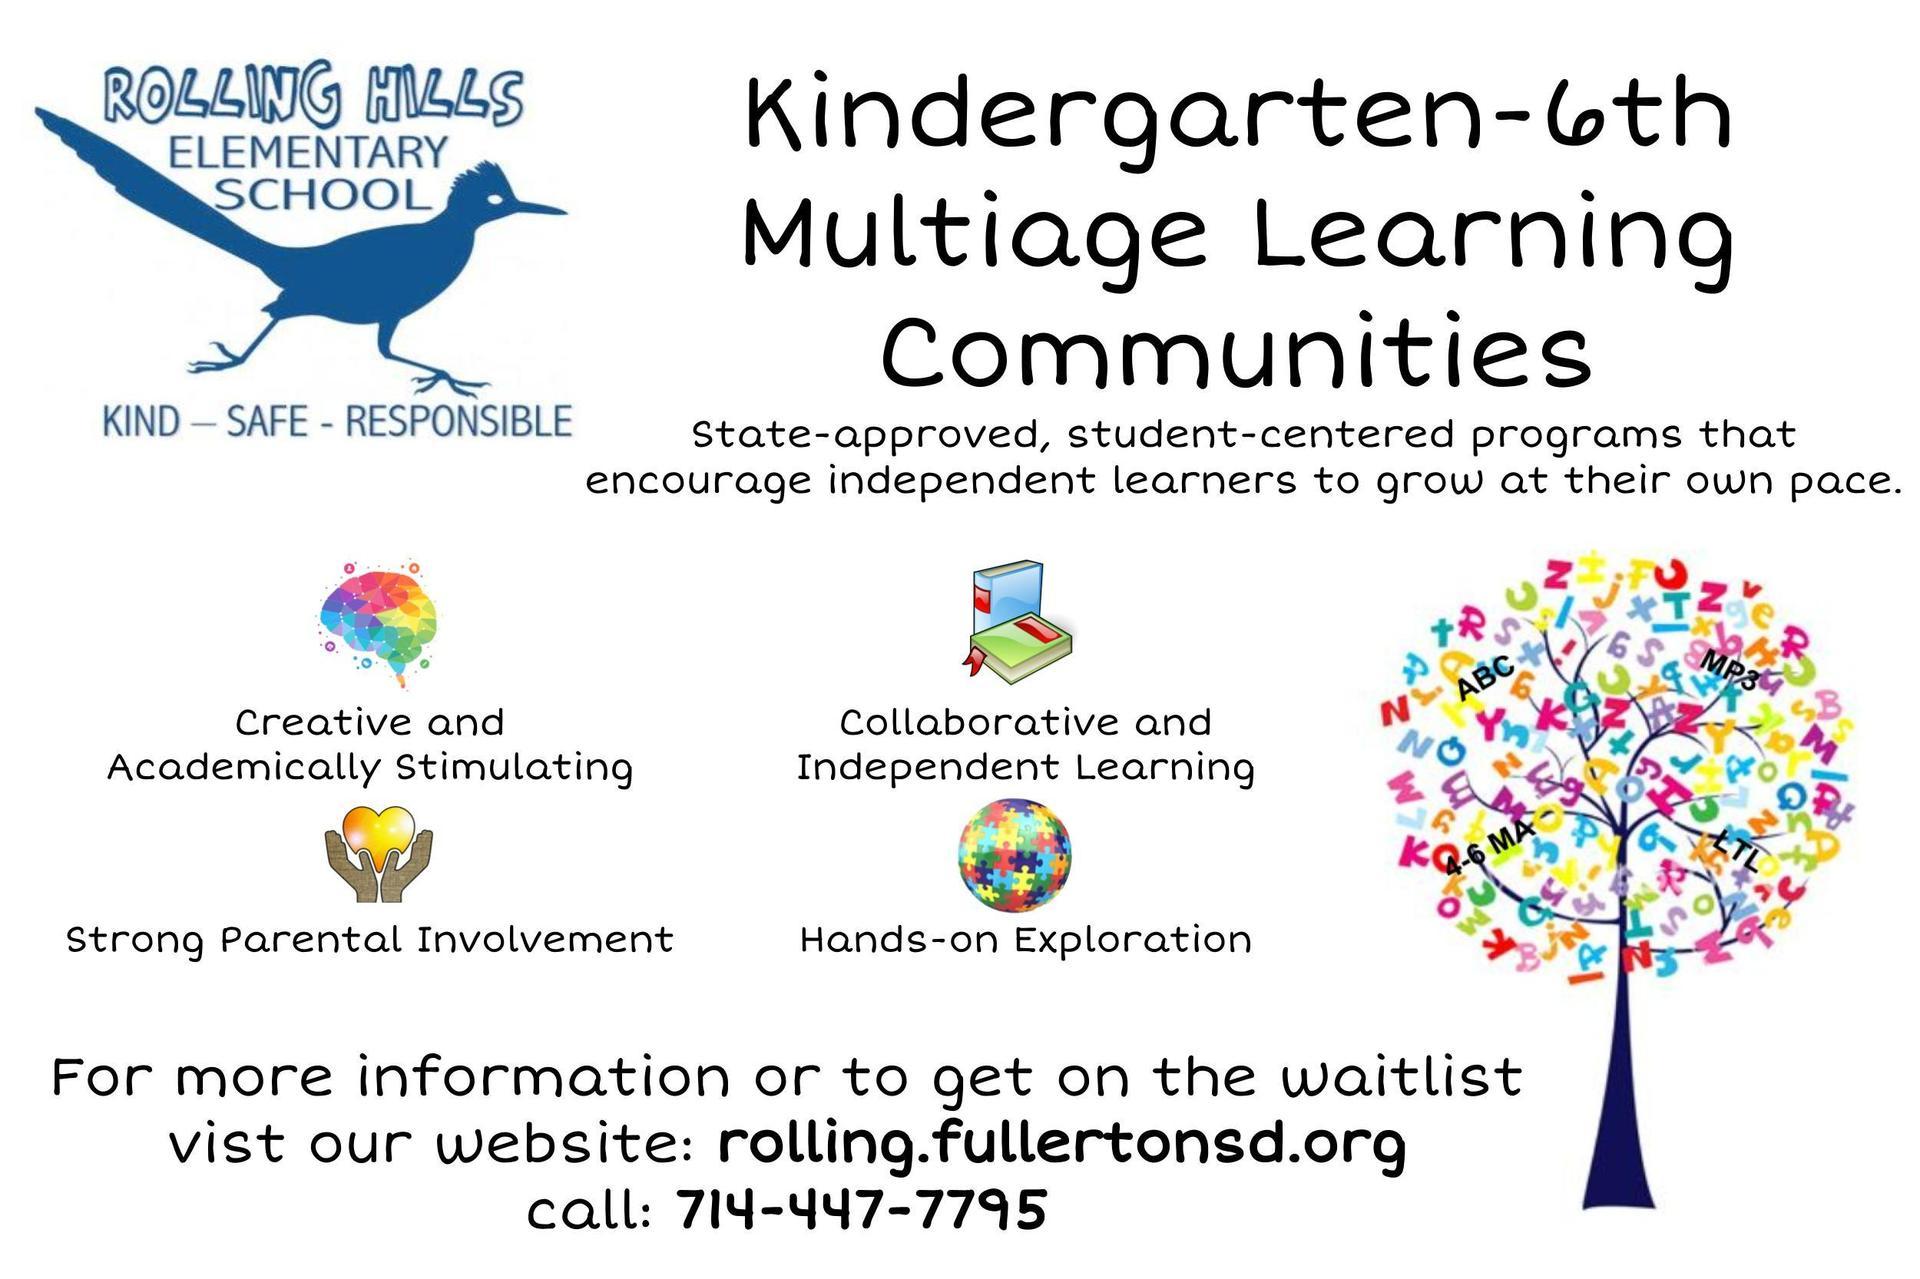 Multiage Community Information